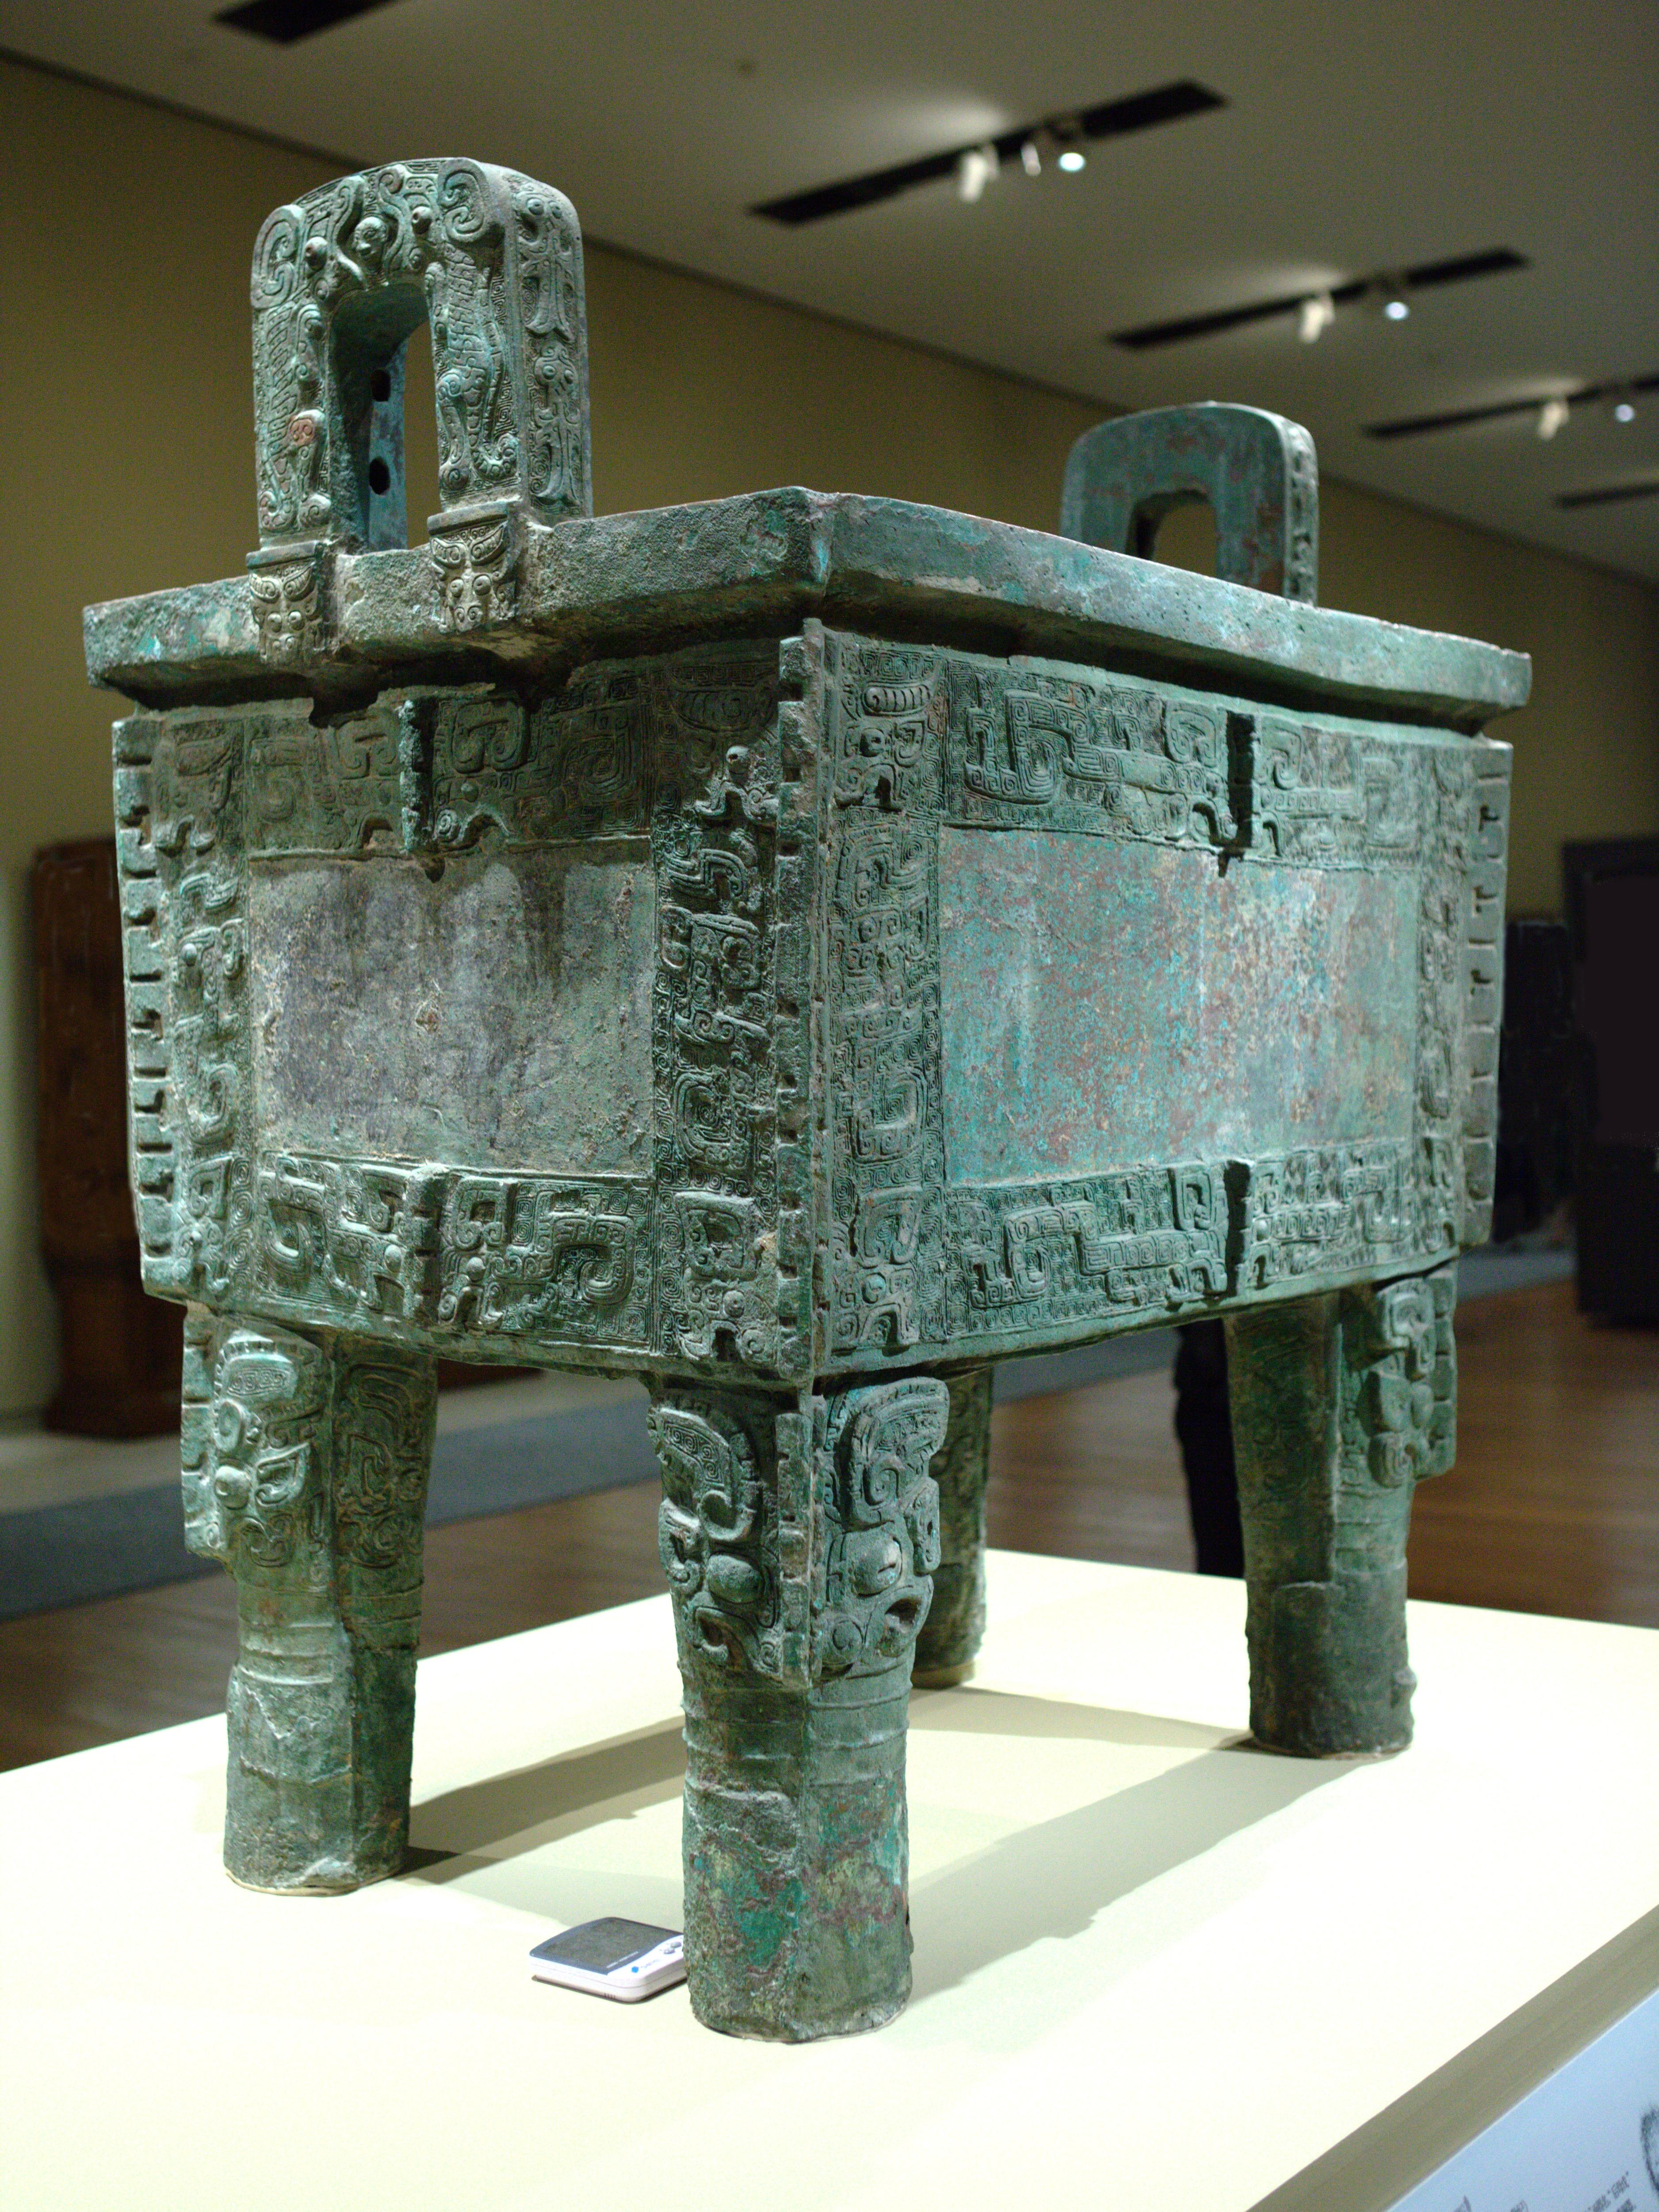 Houmu Wu ding vessel, bronze, Shang dynasty (1600-1050 BCE), China